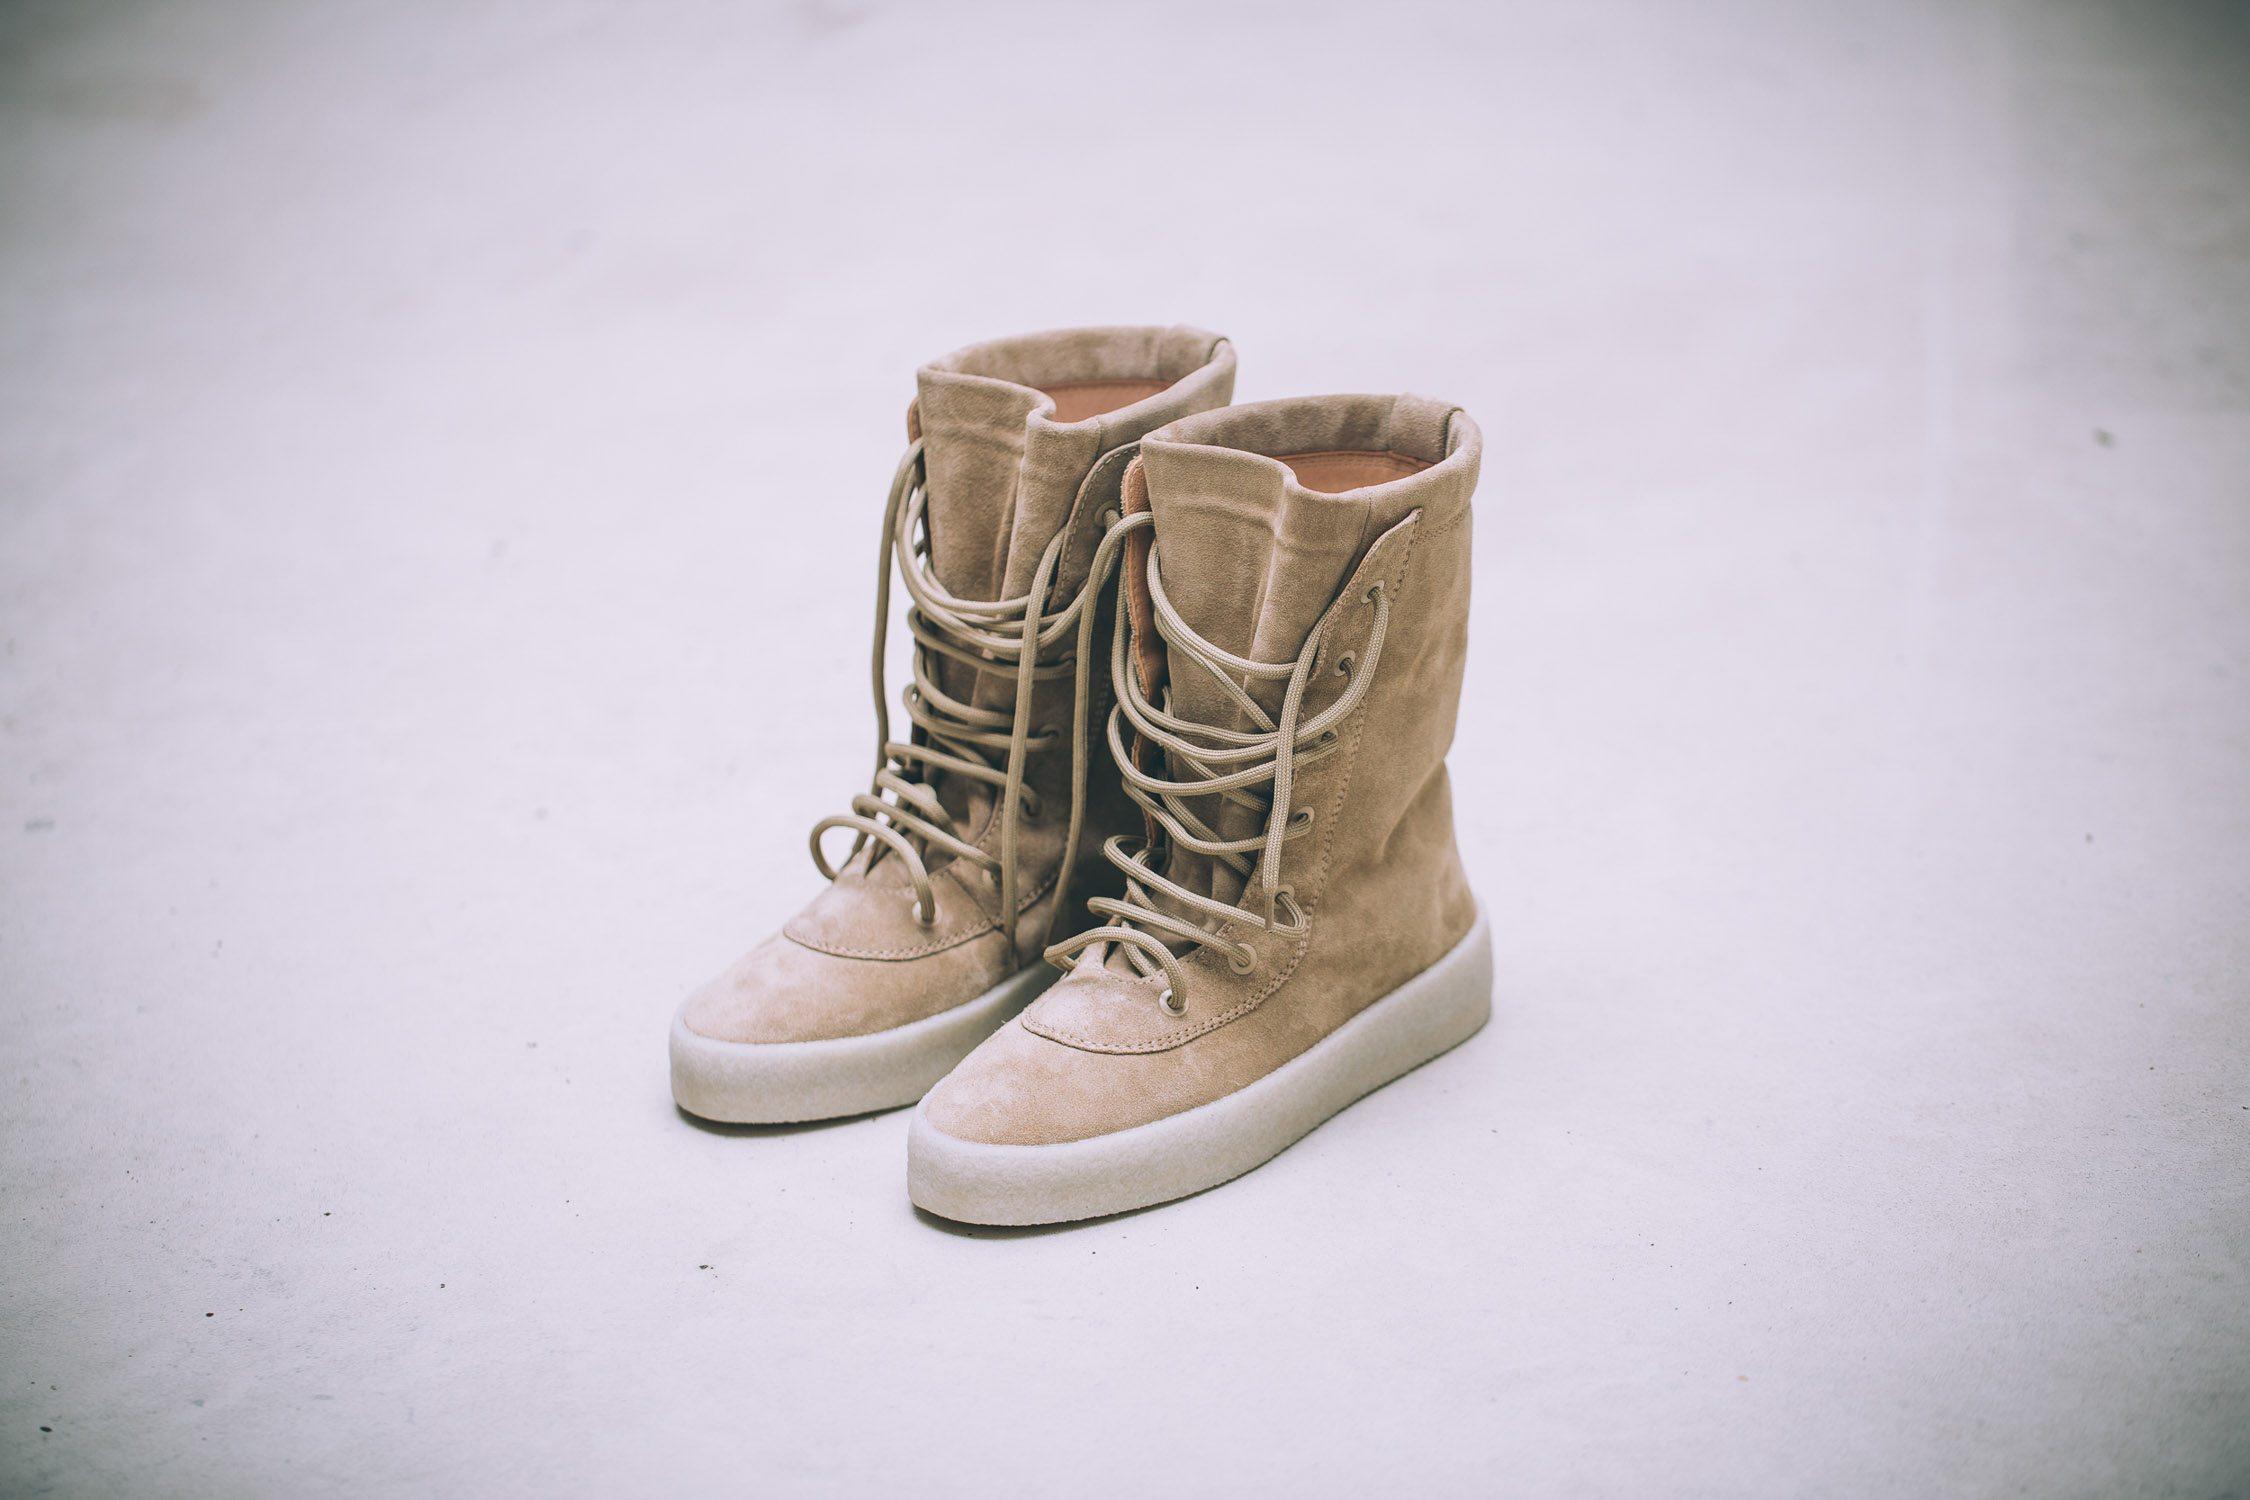 adidas Originals x Kanye West Crepe Boot 5